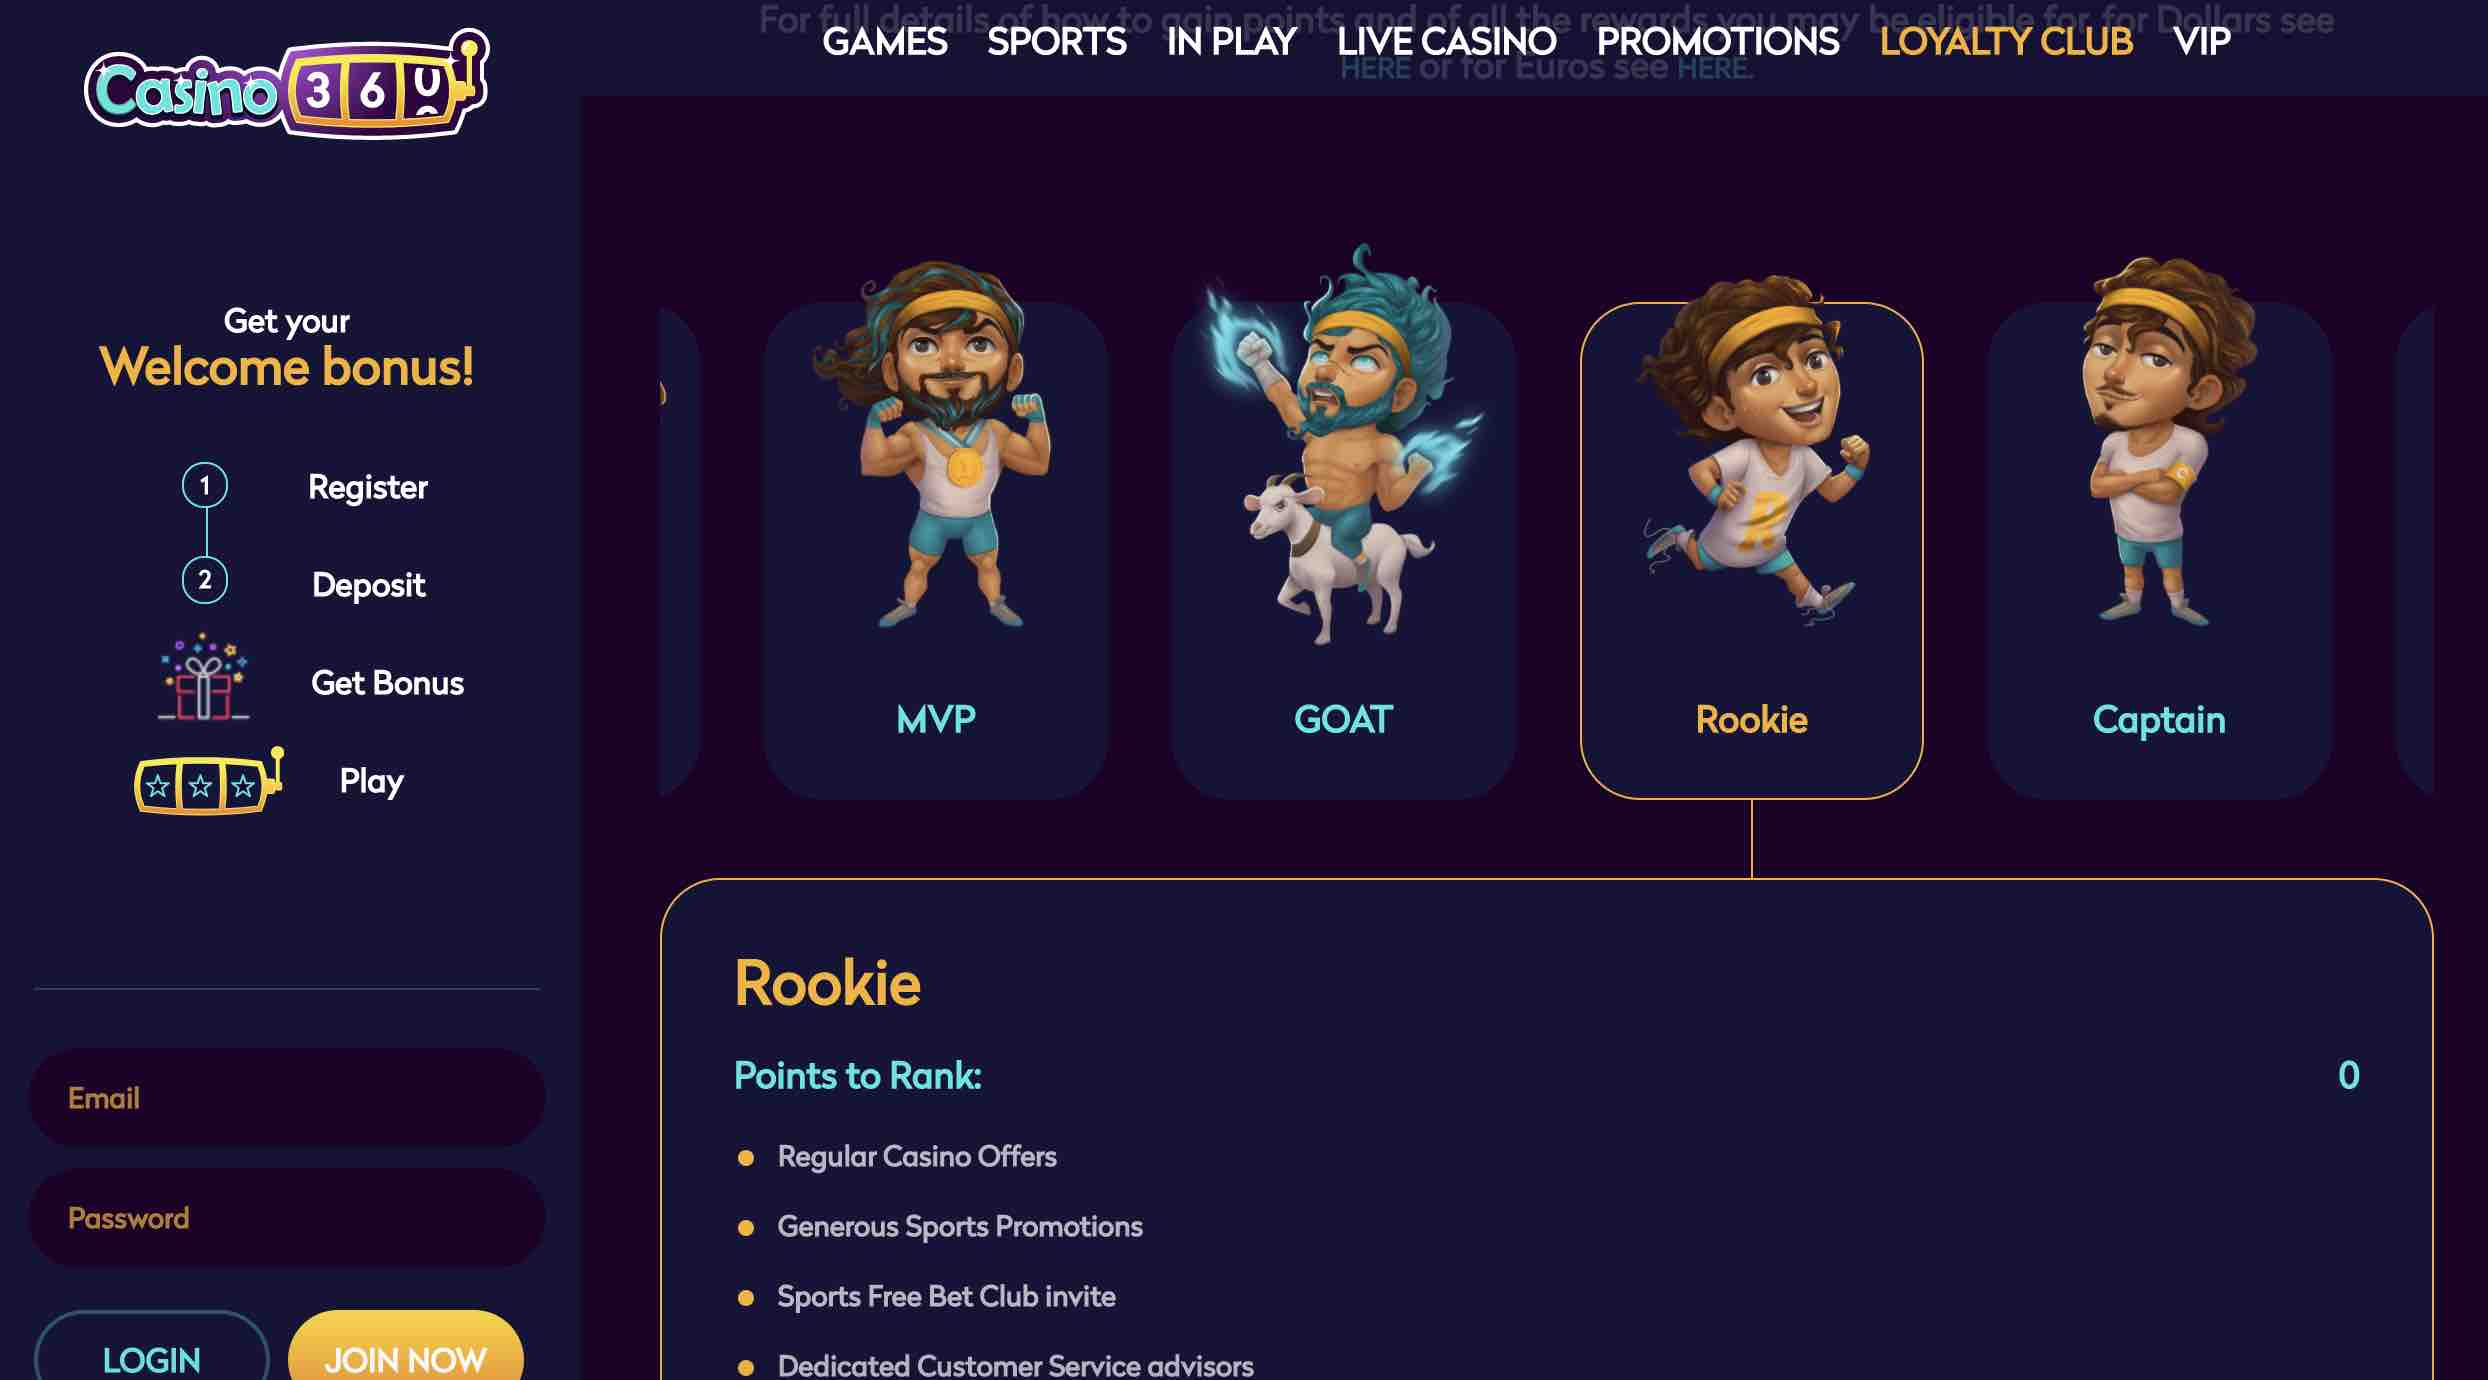 Casino360 Loyalty Program